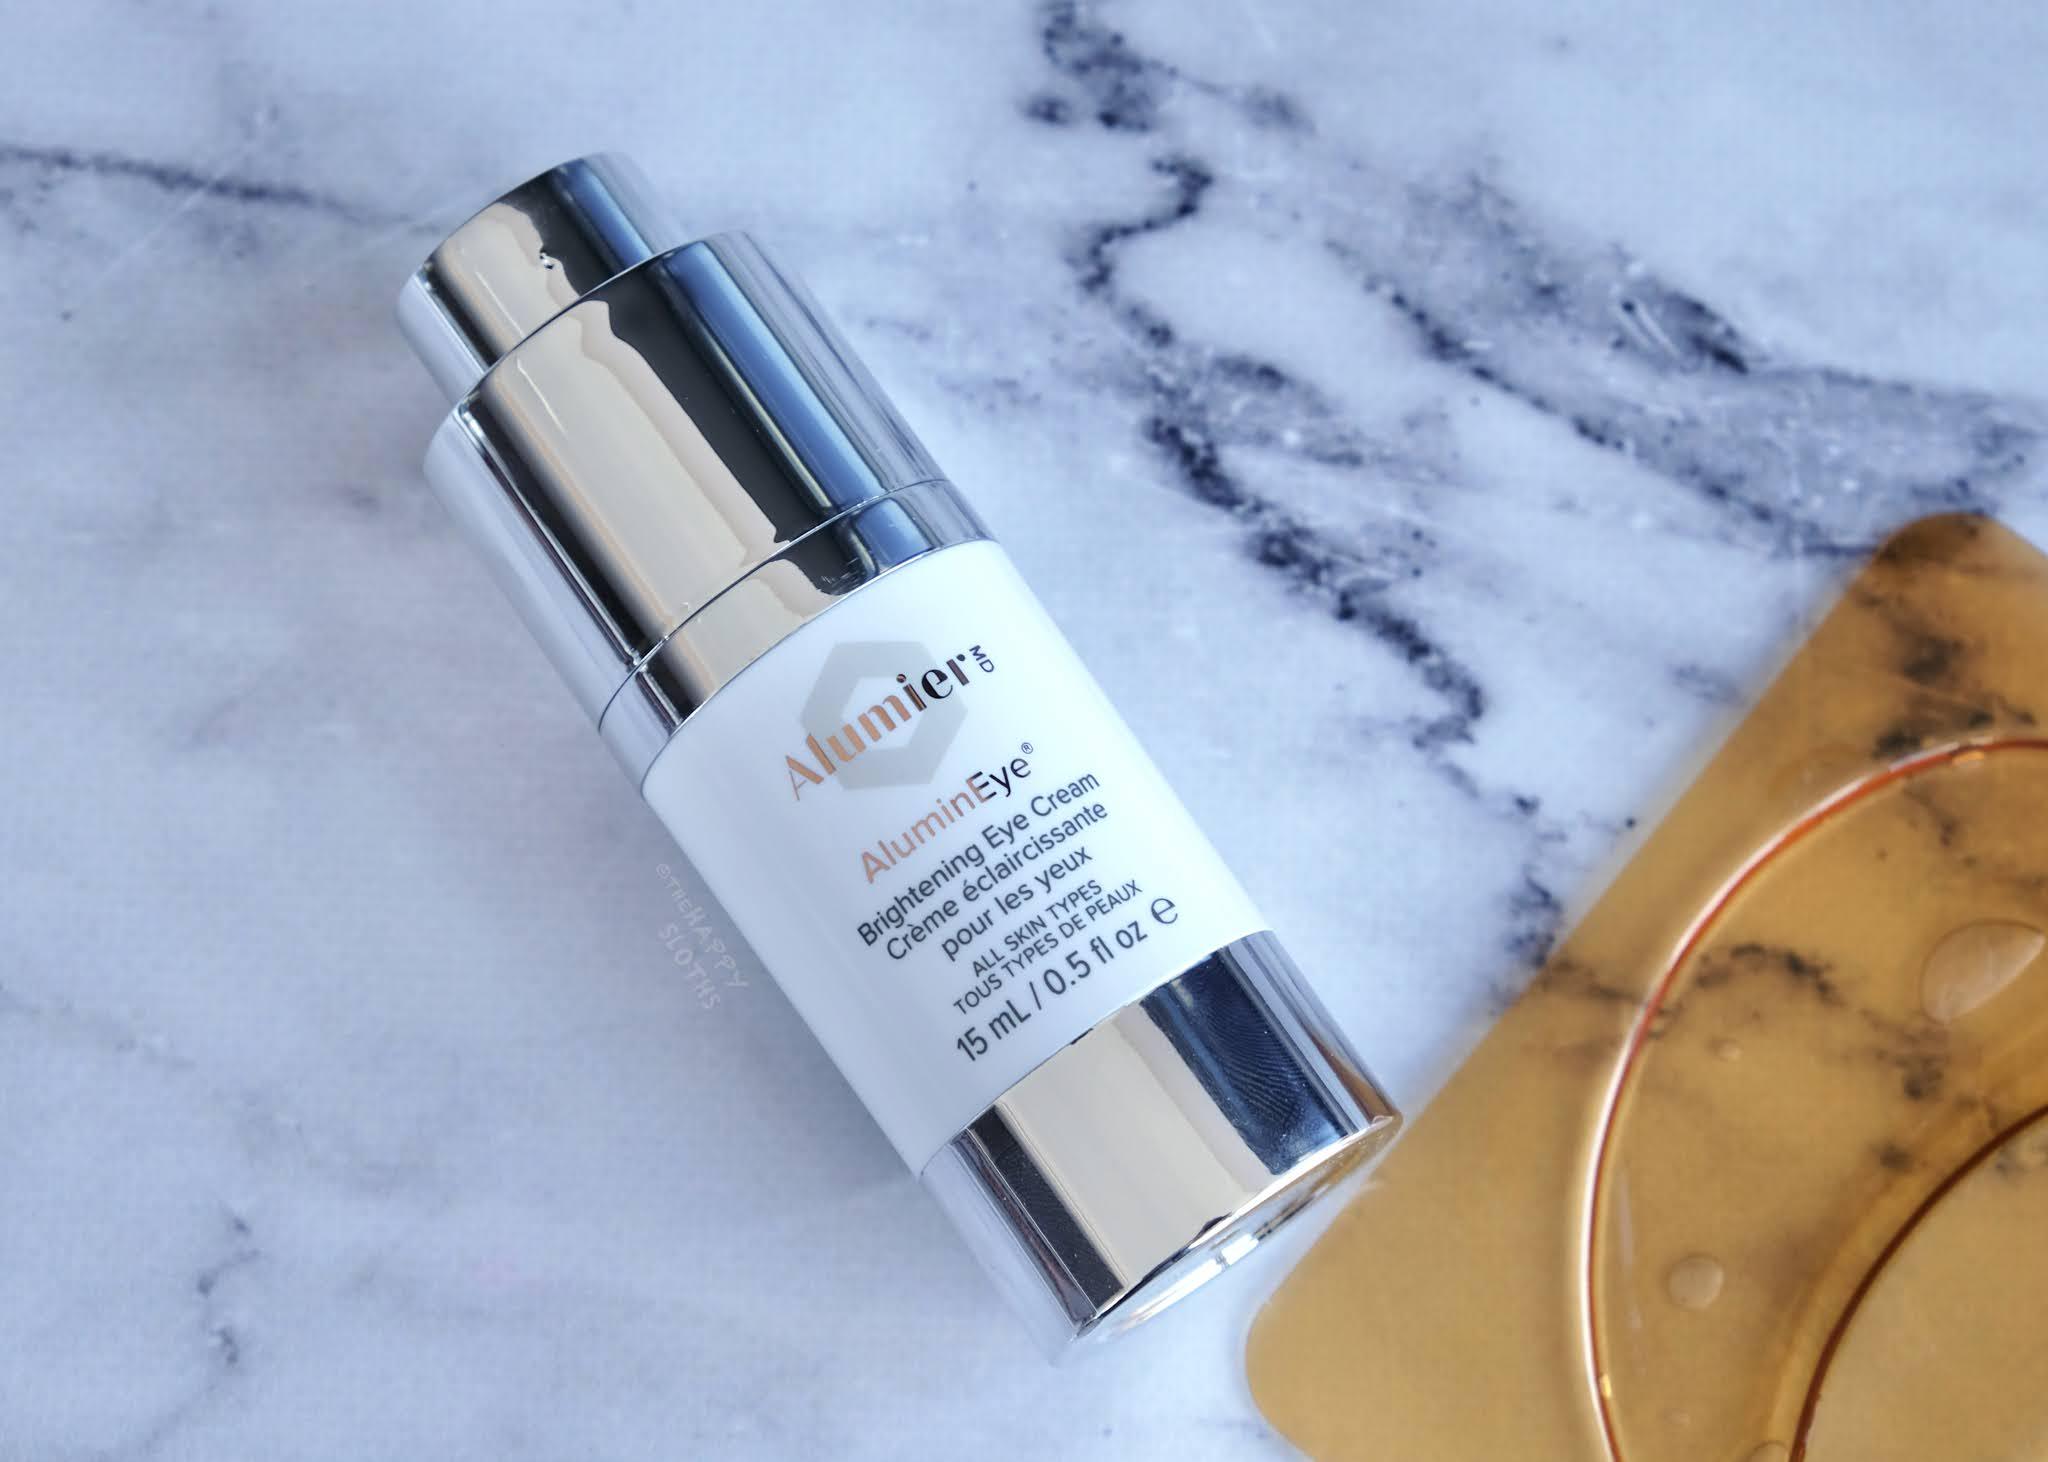 Alumier MD | AluminEye Brightening Eye Cream: Review